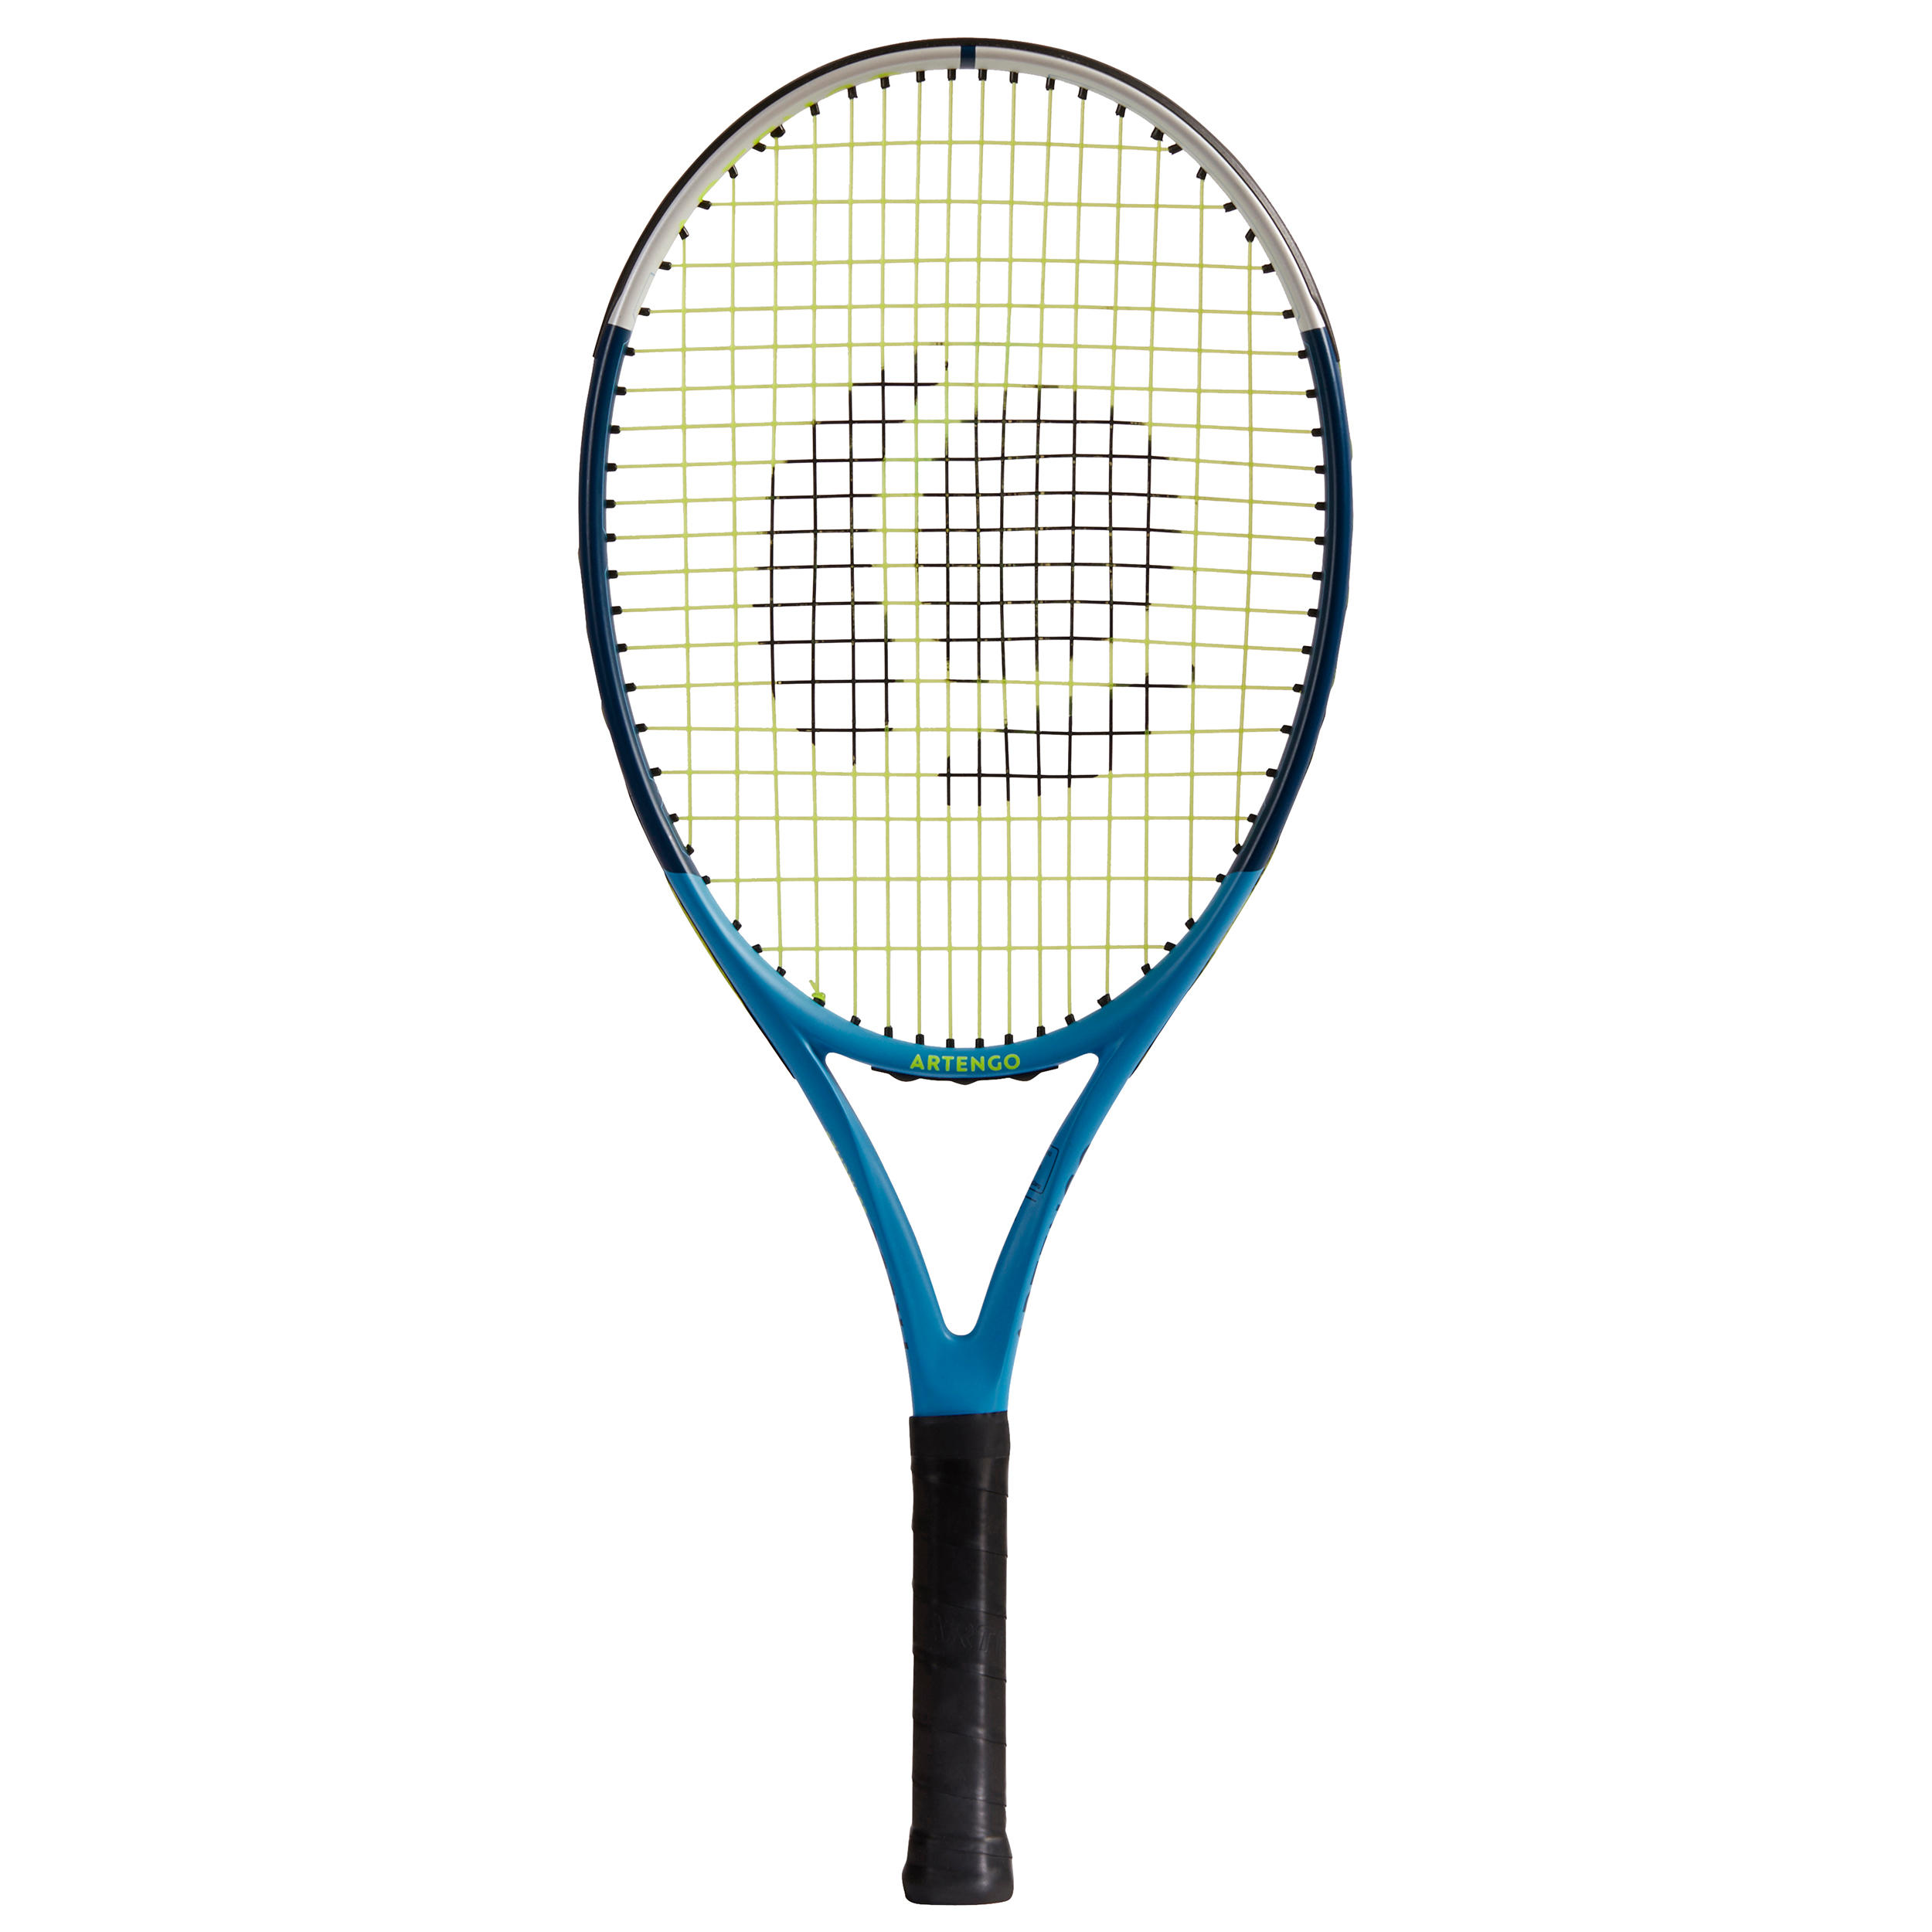 Rachetă Tenis TR530 M25 Copii